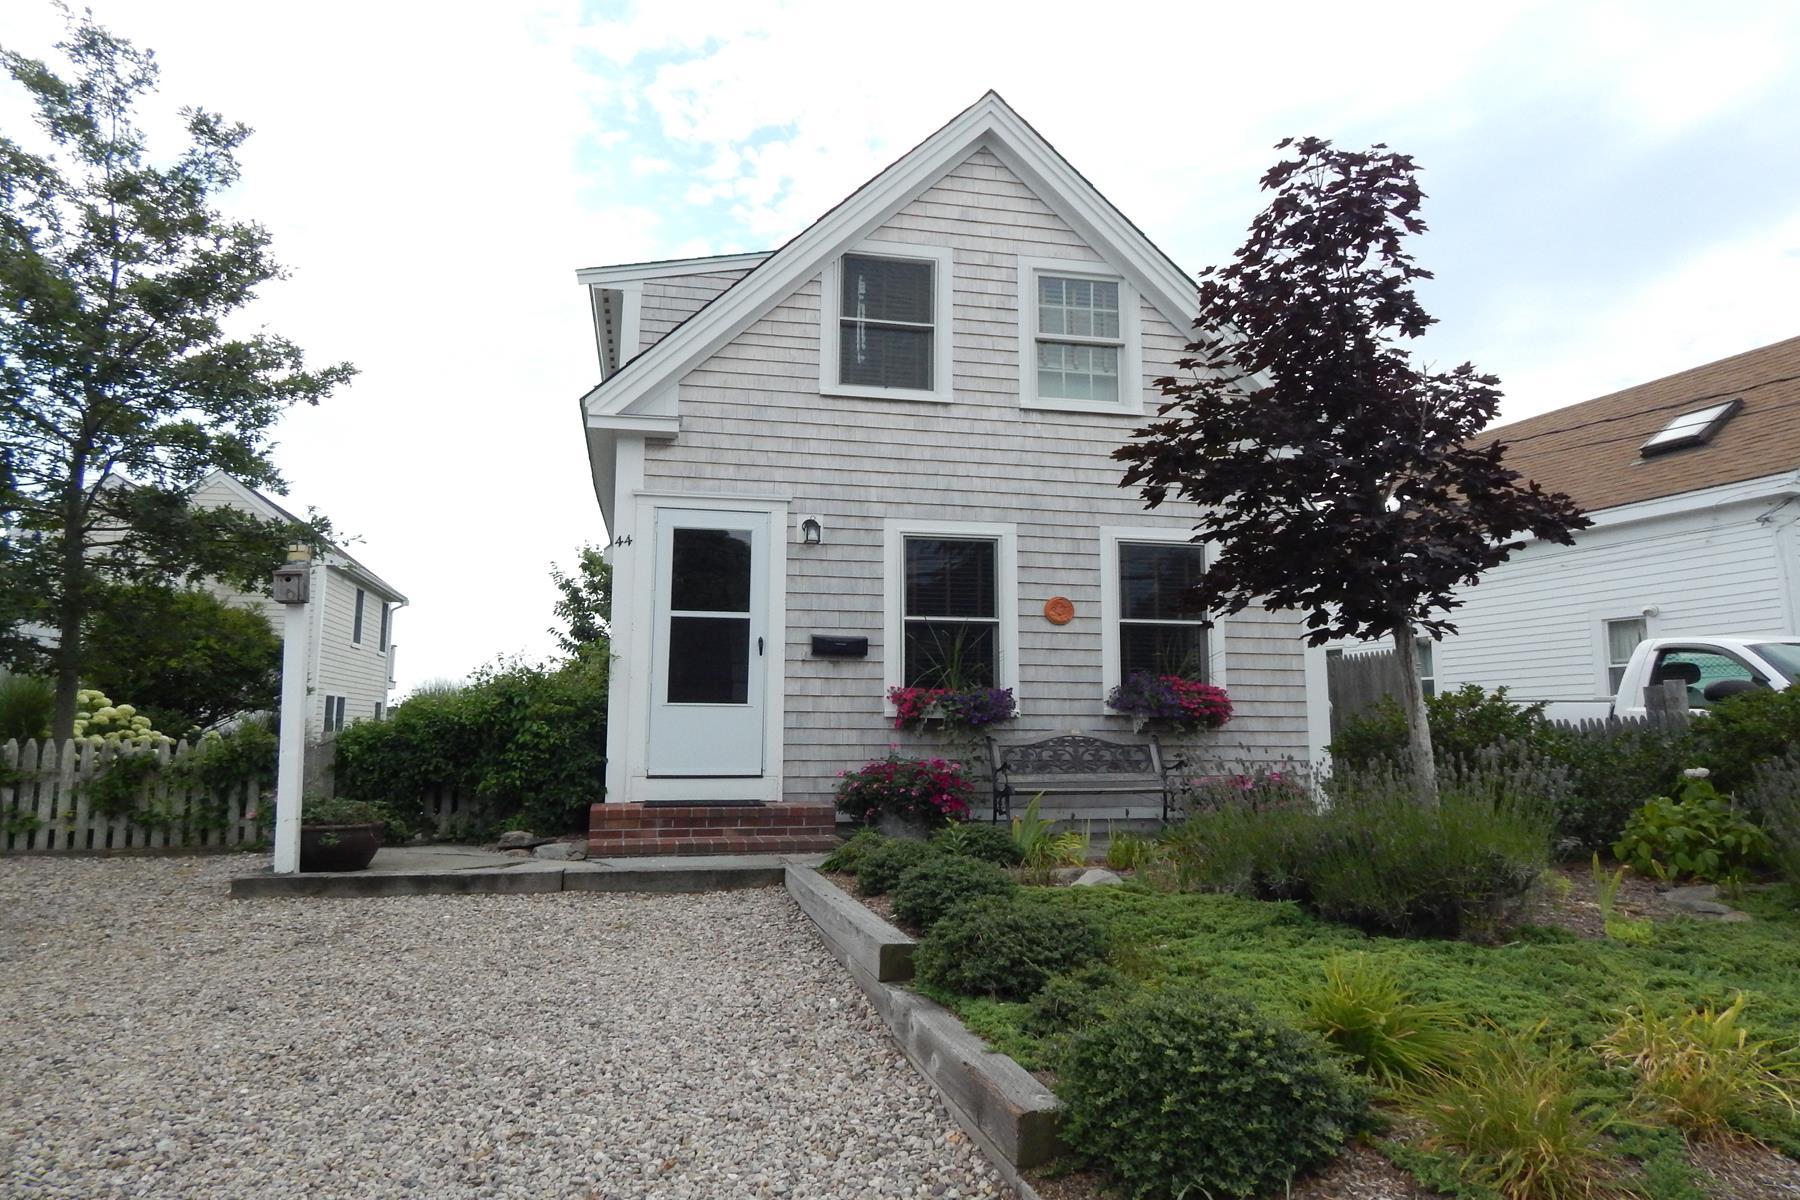 44 Franklin St, Provincetown, MA 02657